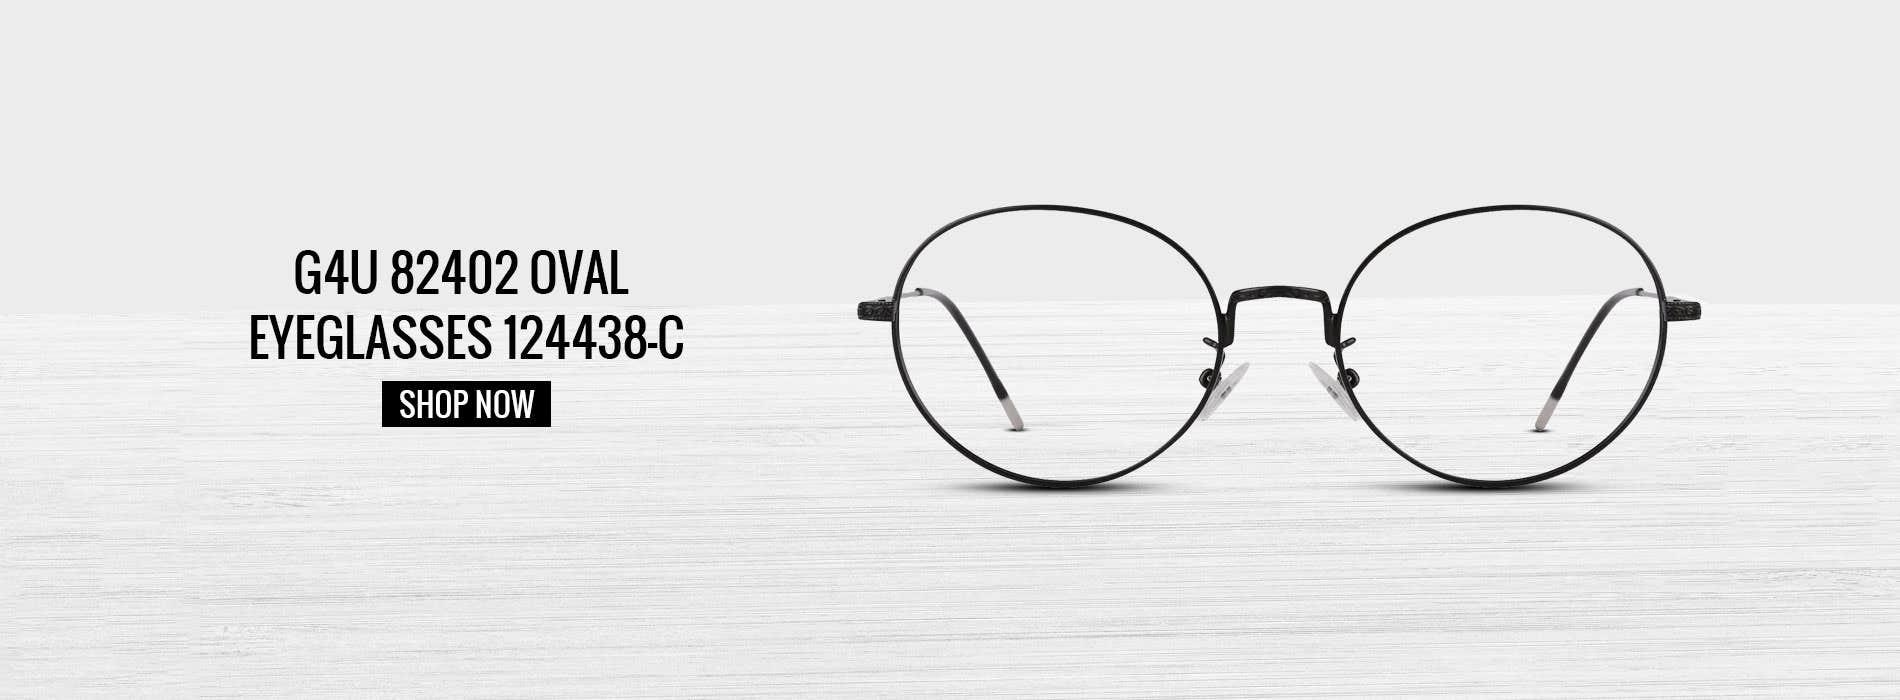 Buy G4U 82402 Oval Eyeglasses